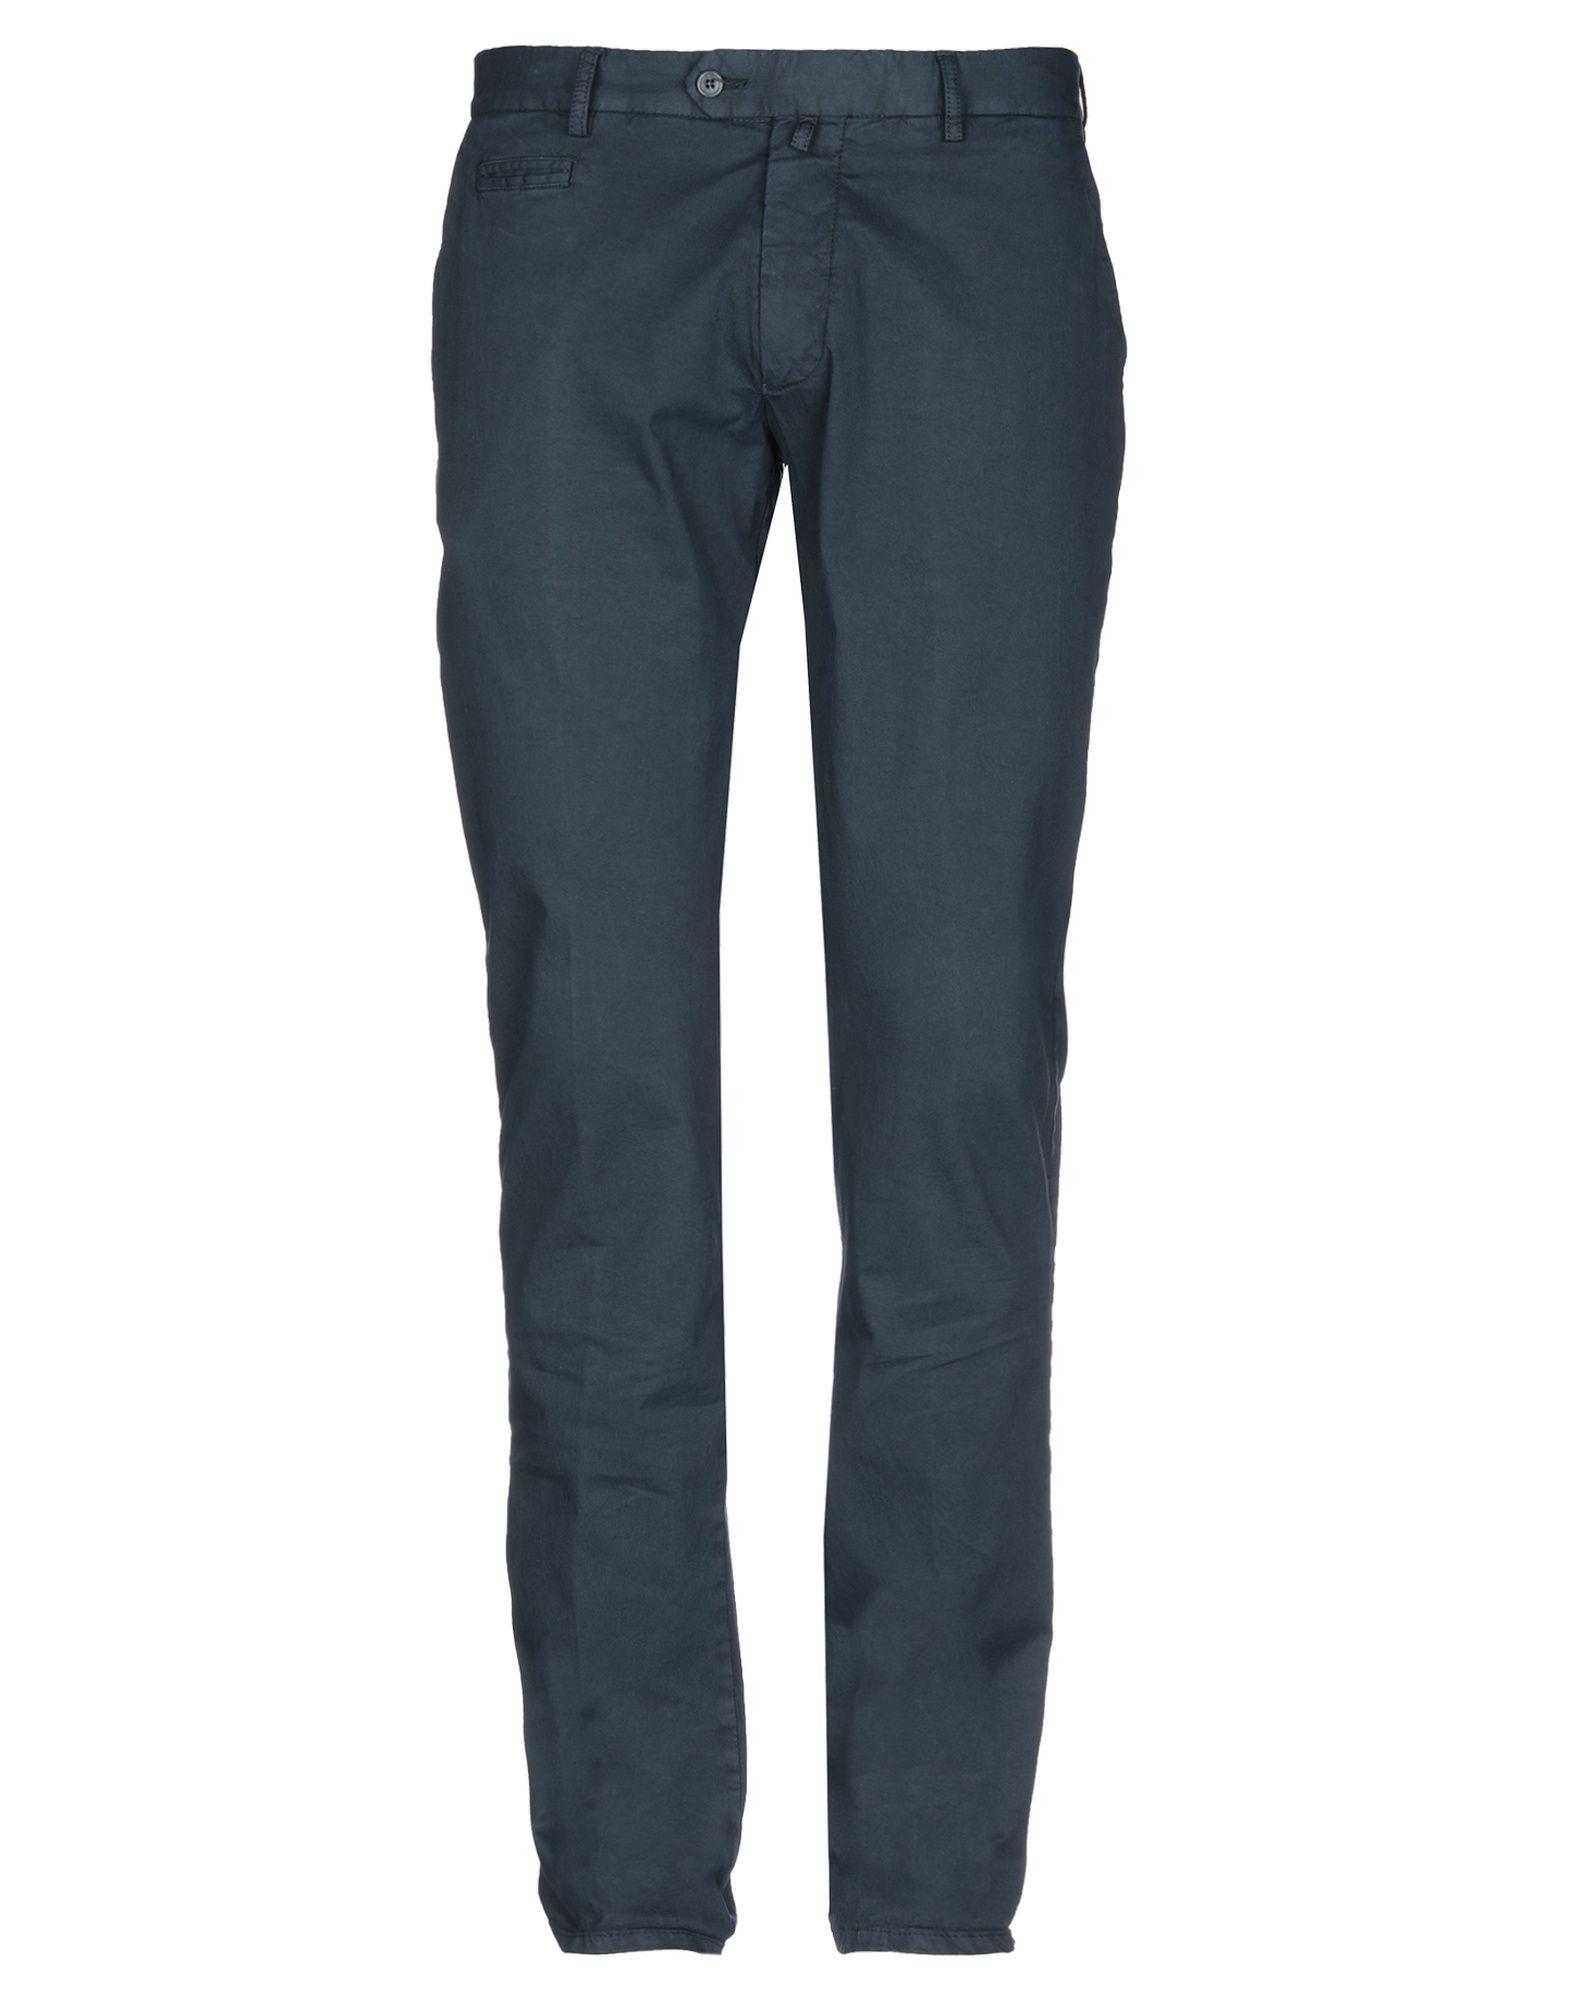 Фото - BRIAN & BARRY® Повседневные брюки barry pain marge askinforit